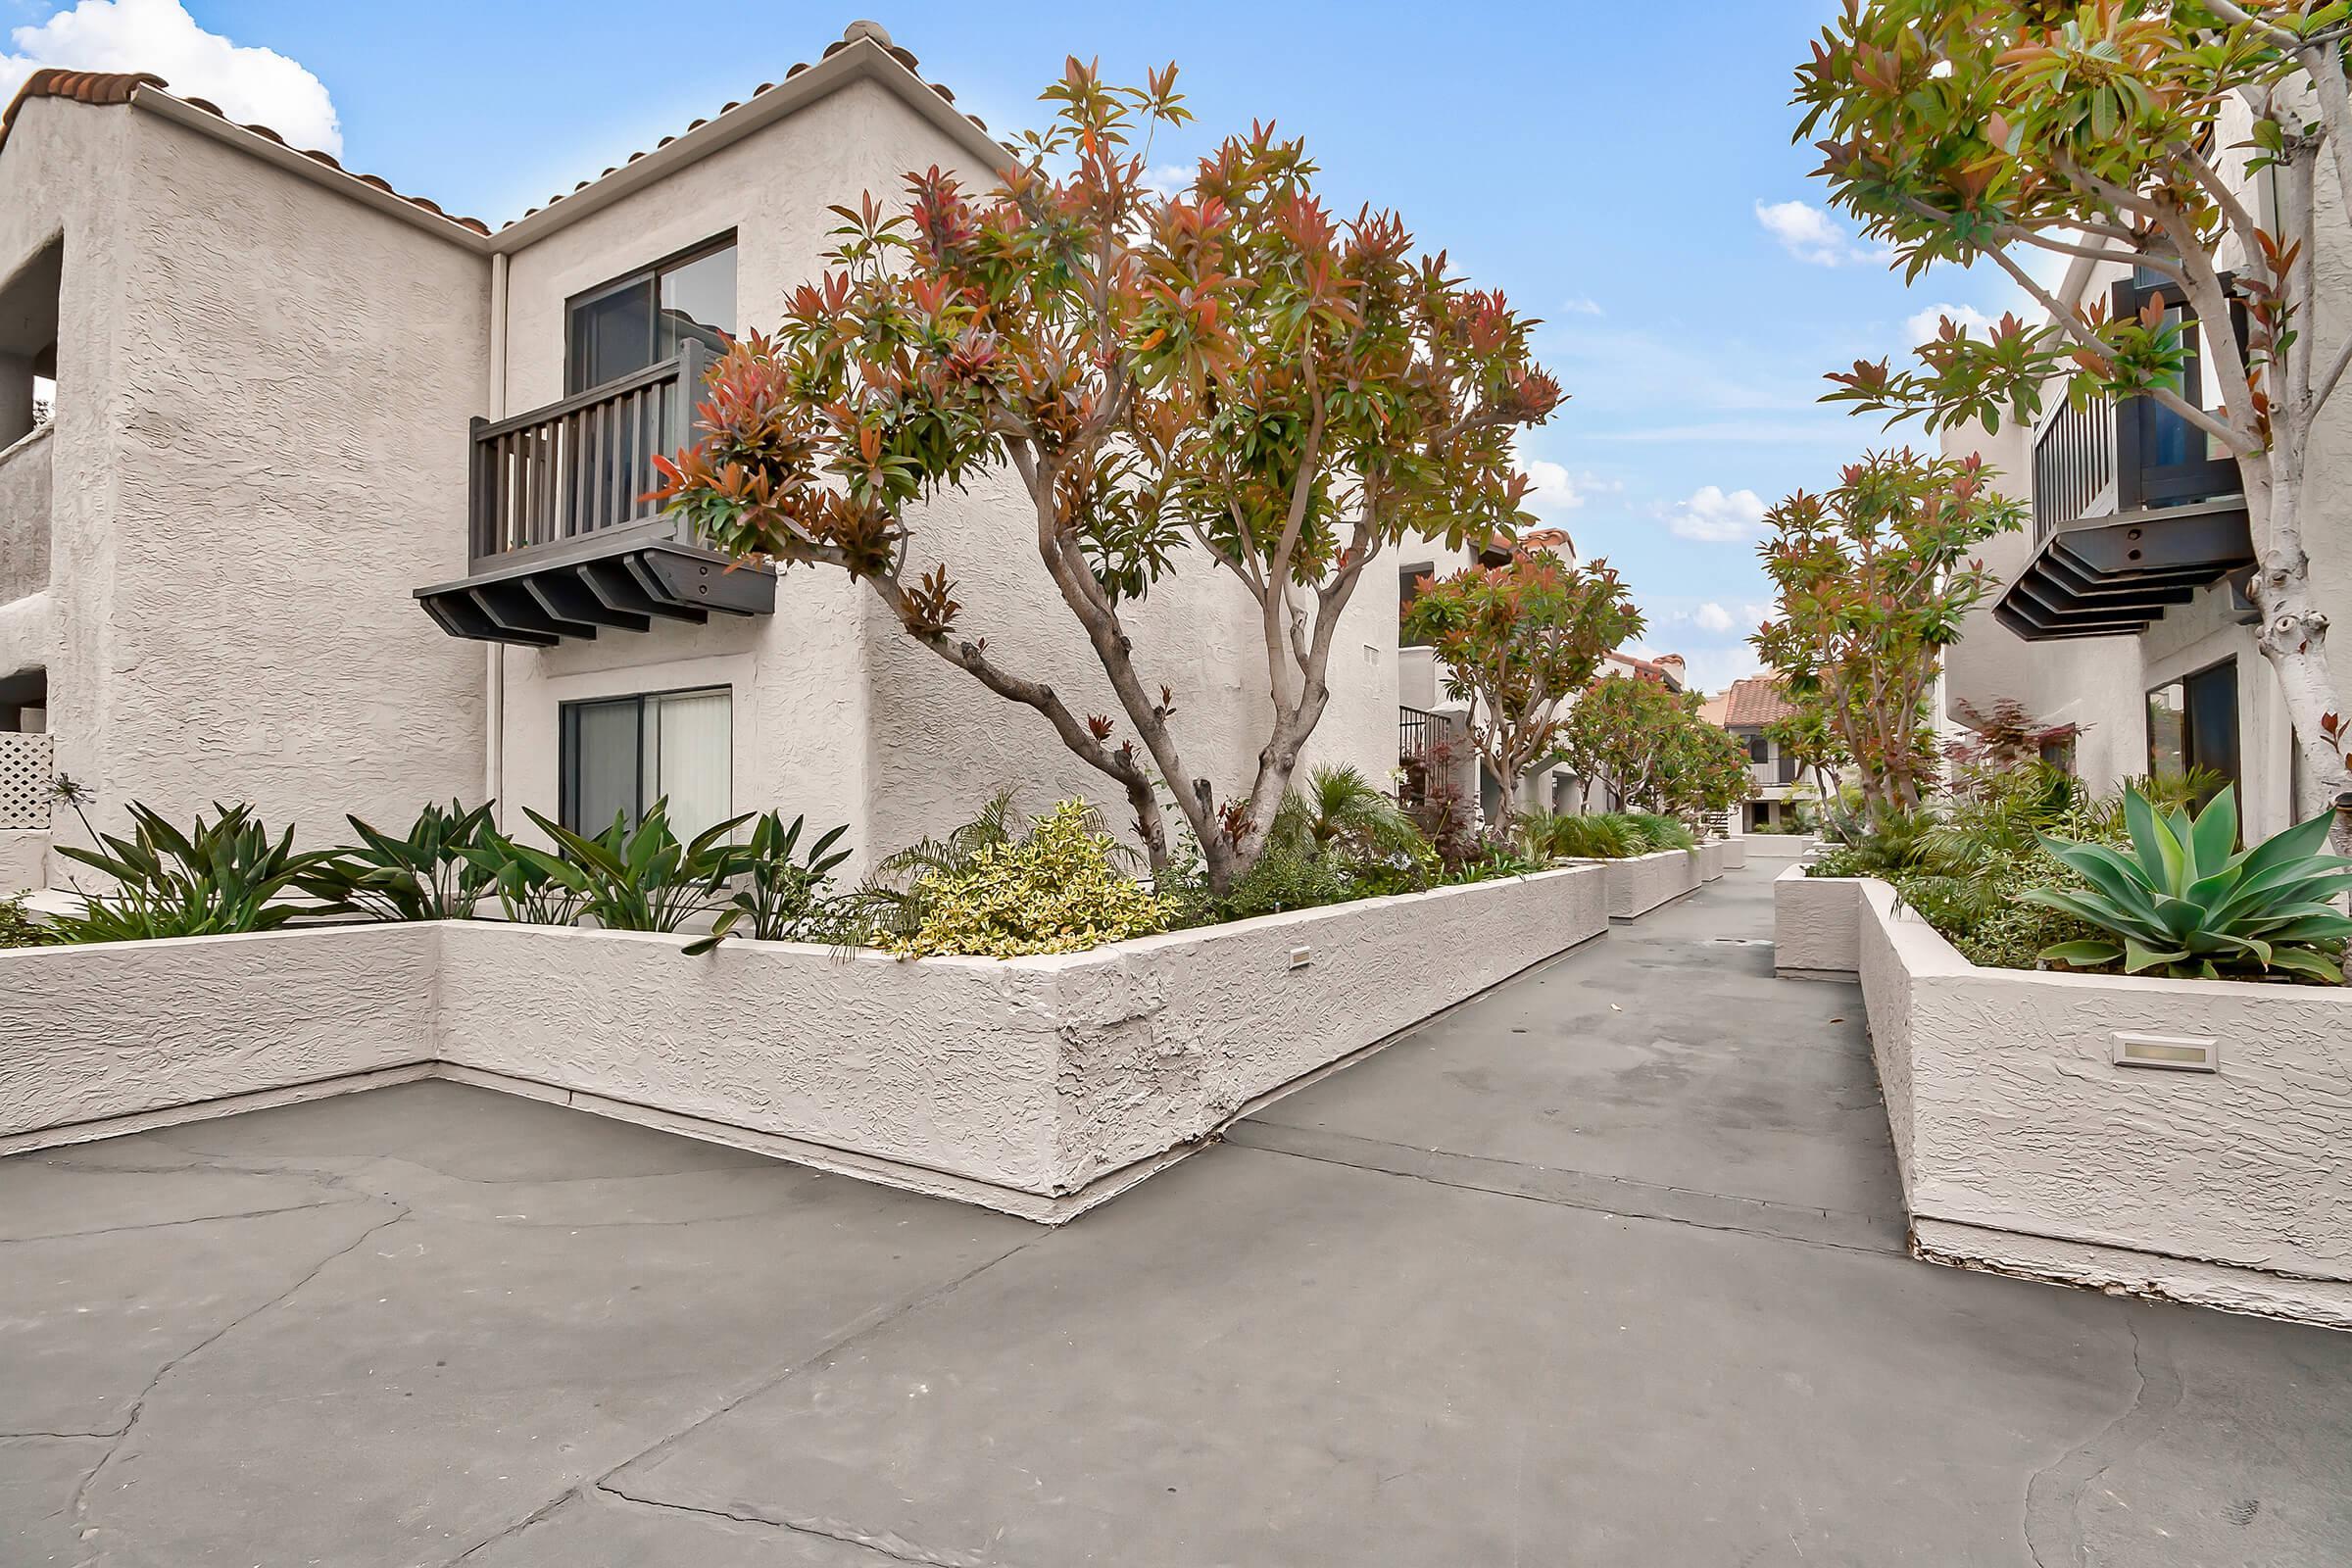 Exterior-Building-Units_575-W-19Th-St-Costa-Mesa-CA_Park-Center-Place_RPI_II-280960-44.jpg